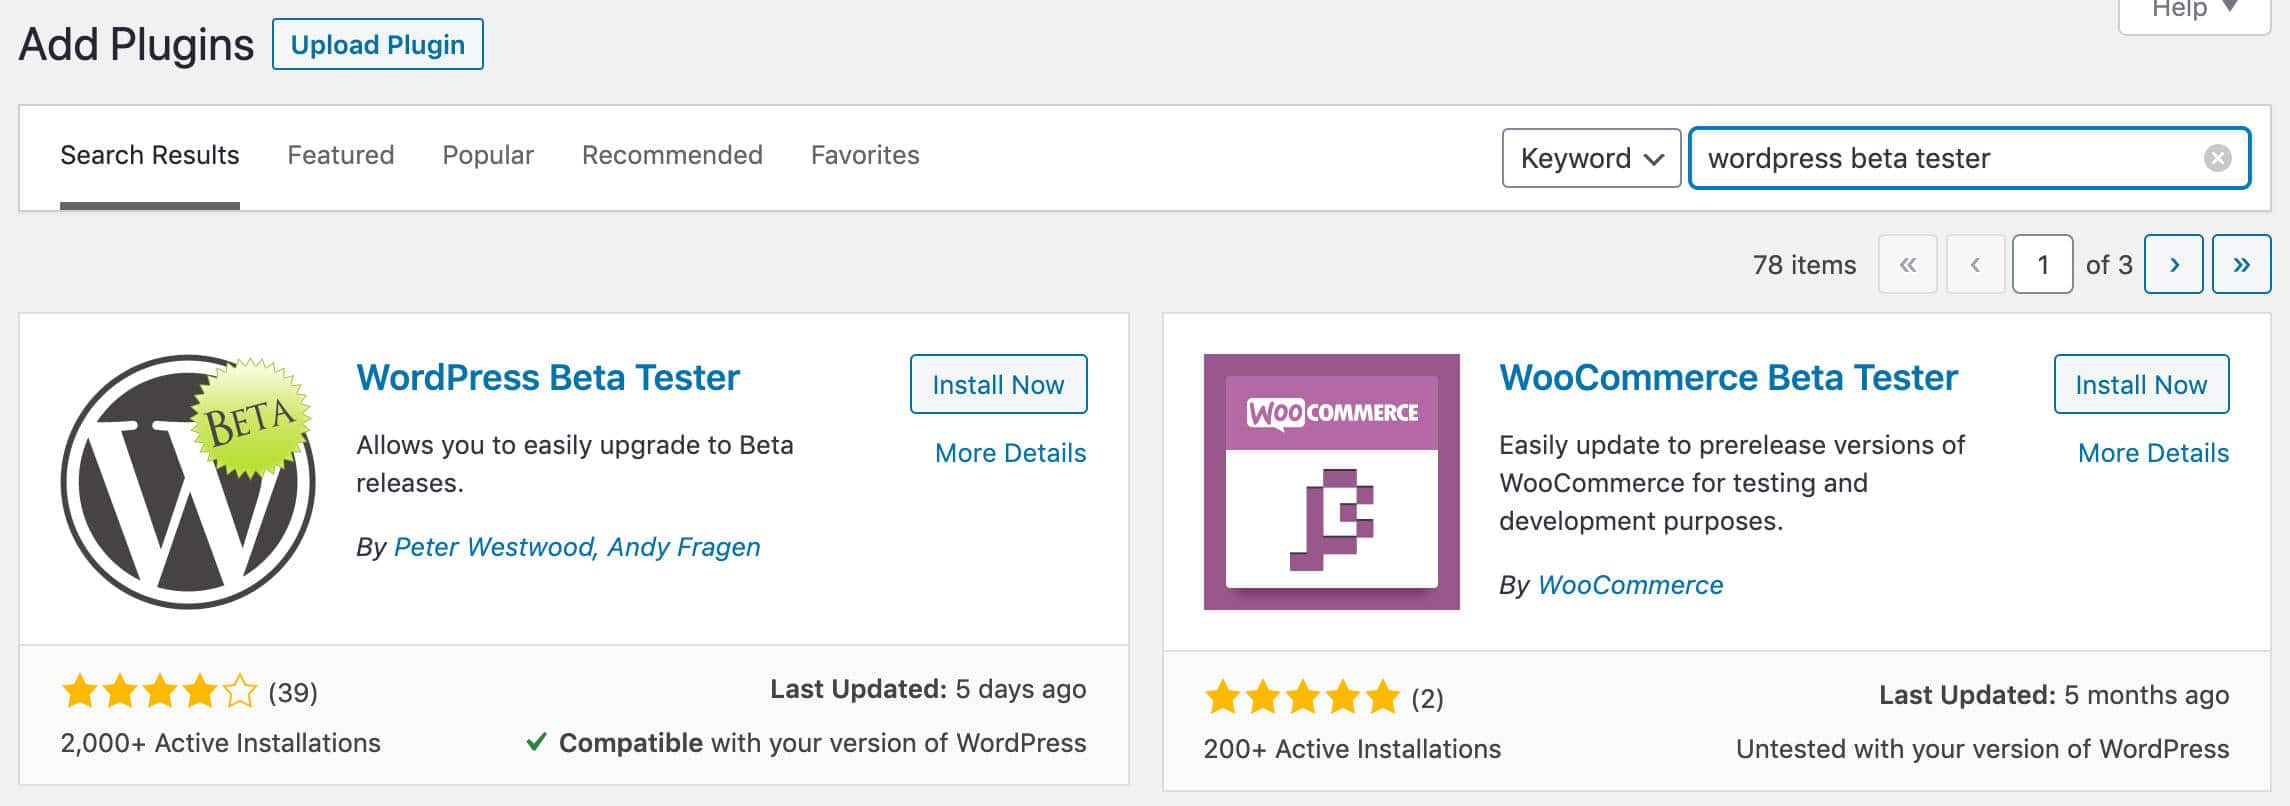 WordPress Beta Tester installeren